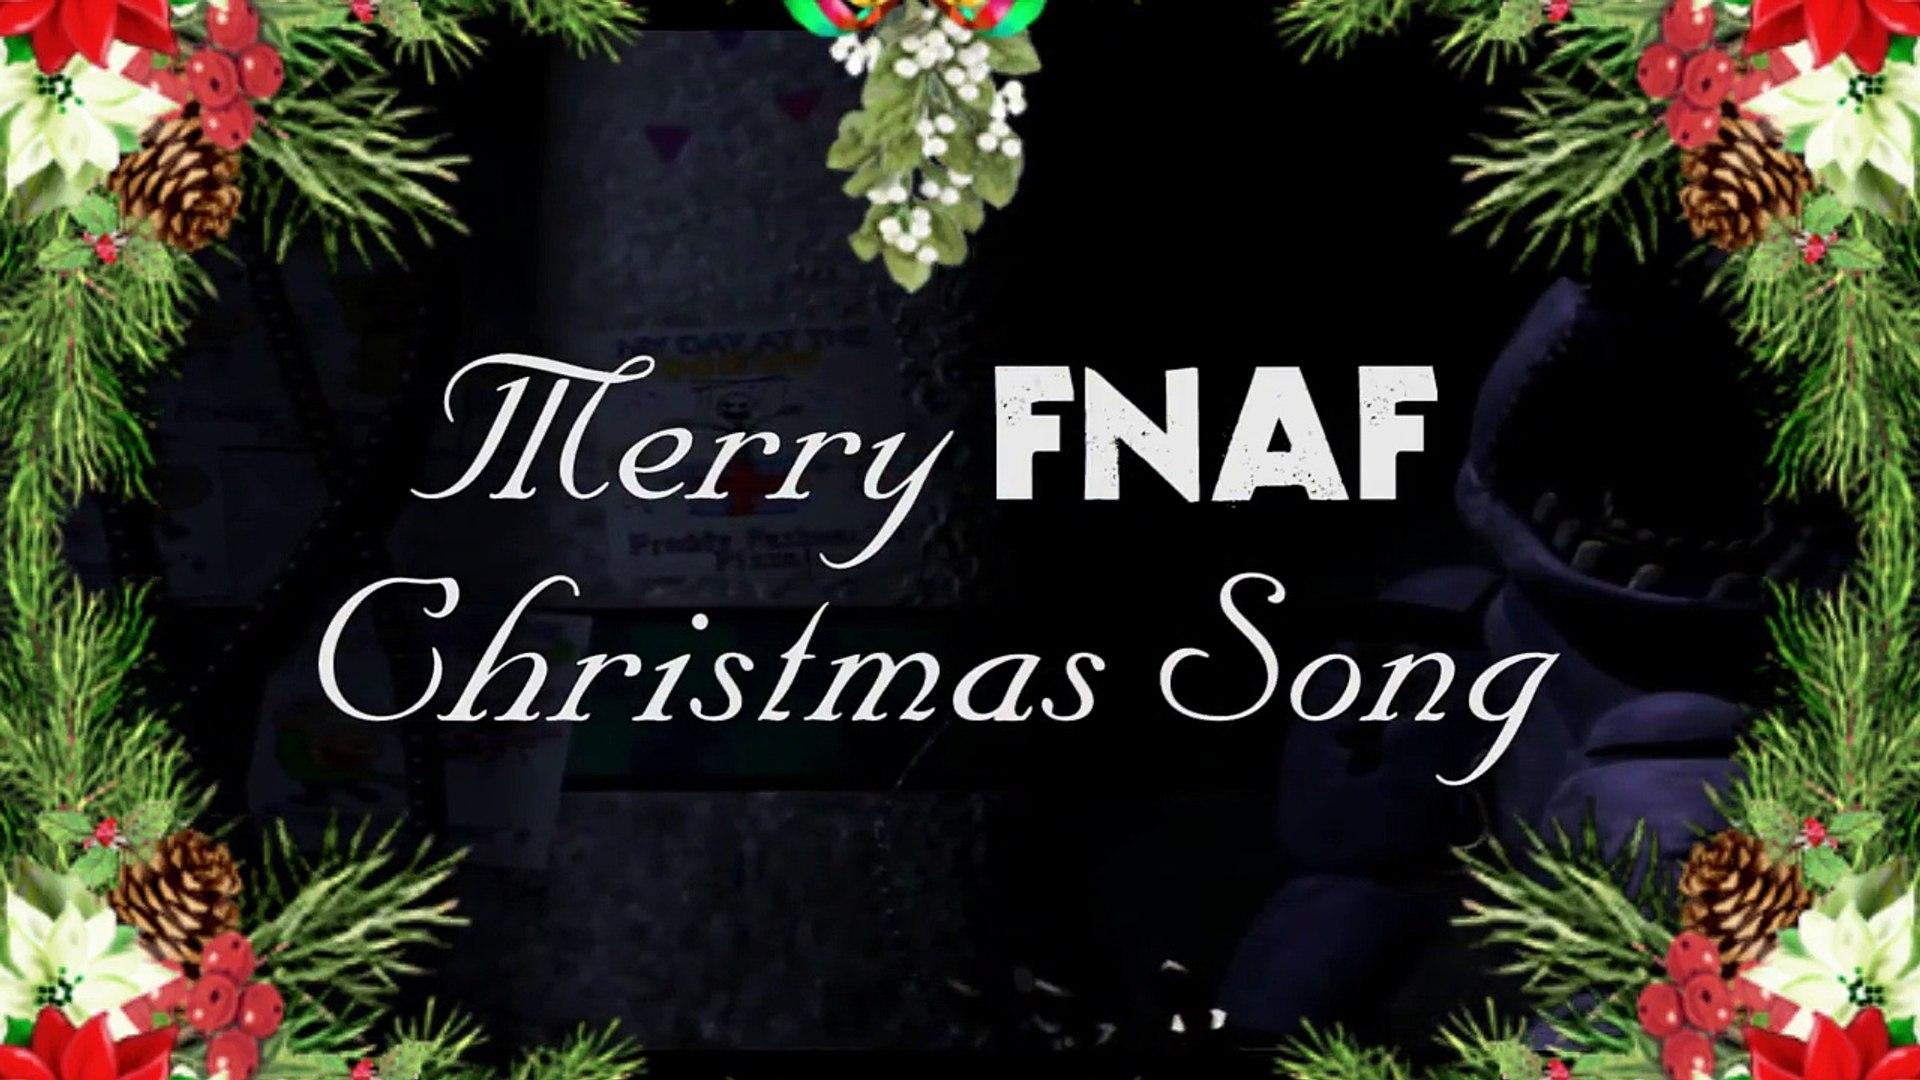 Fnaf Christmas.Merry Fnaf Christmas Song By Jt Machinima